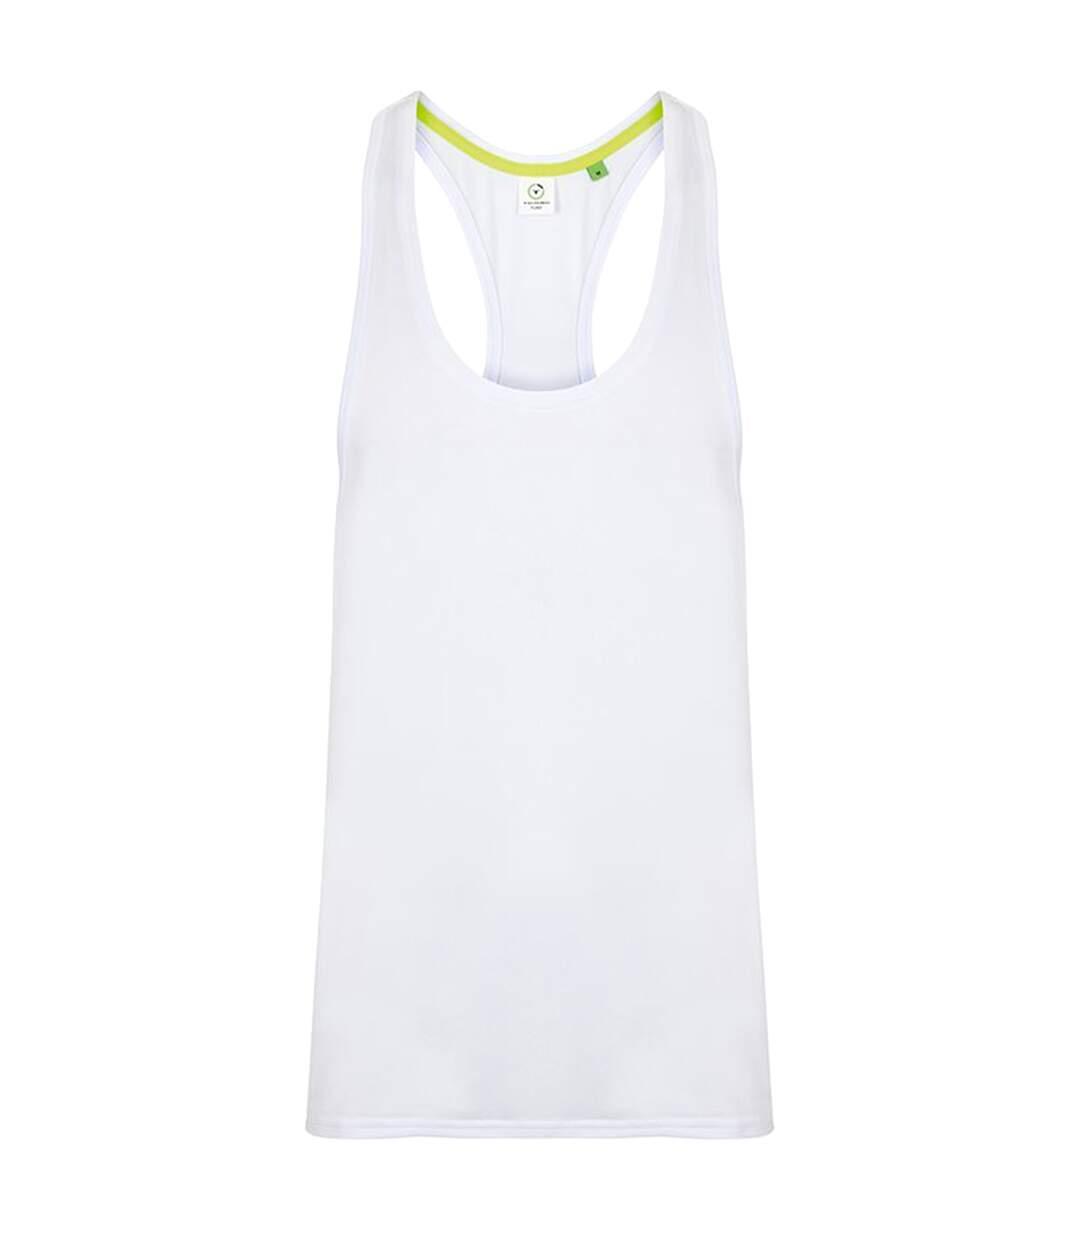 Tombo Mens Muscle Vest (Grey Marl) - UTRW5472